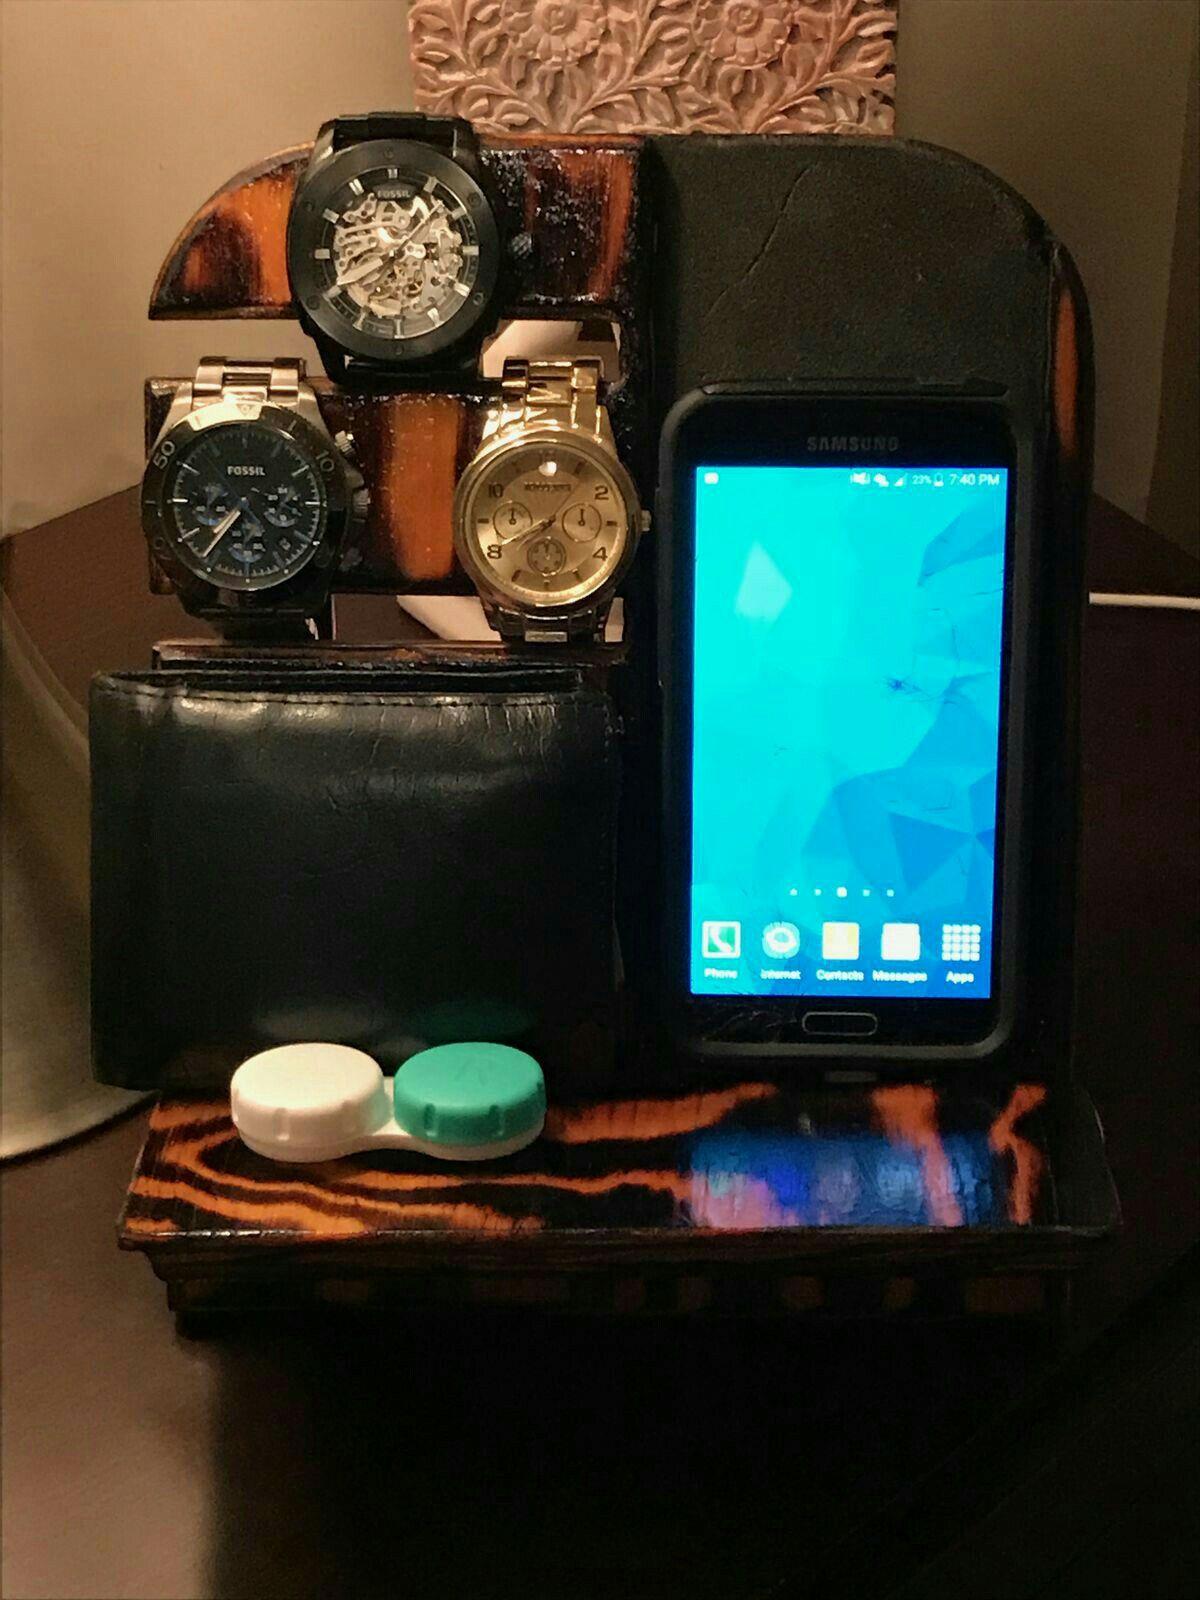 Diy nightstand organizer men homemade cell phone holder